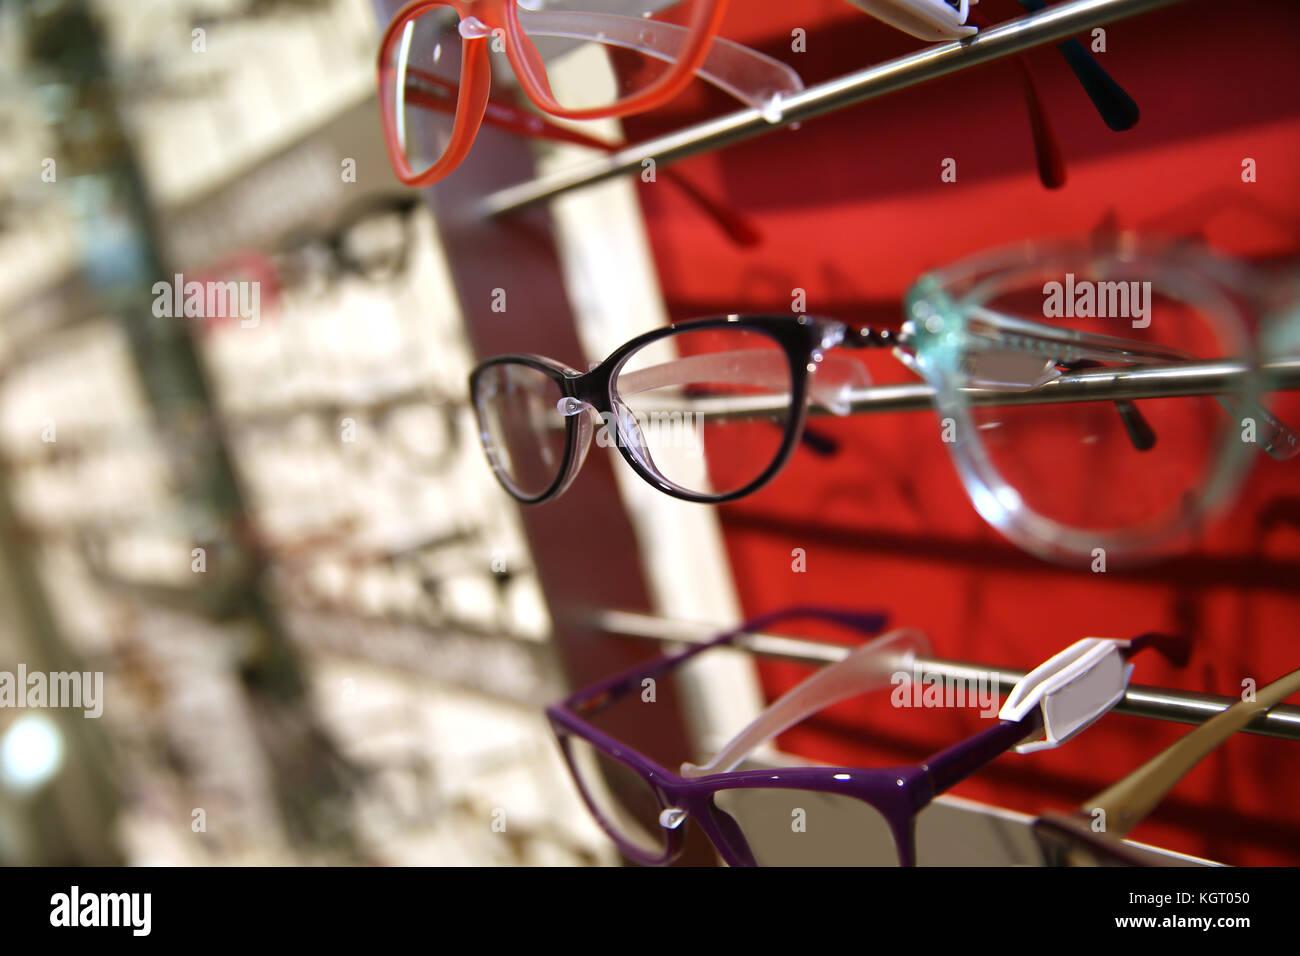 Eyeglasses set on a display unit in shop - Stock Image